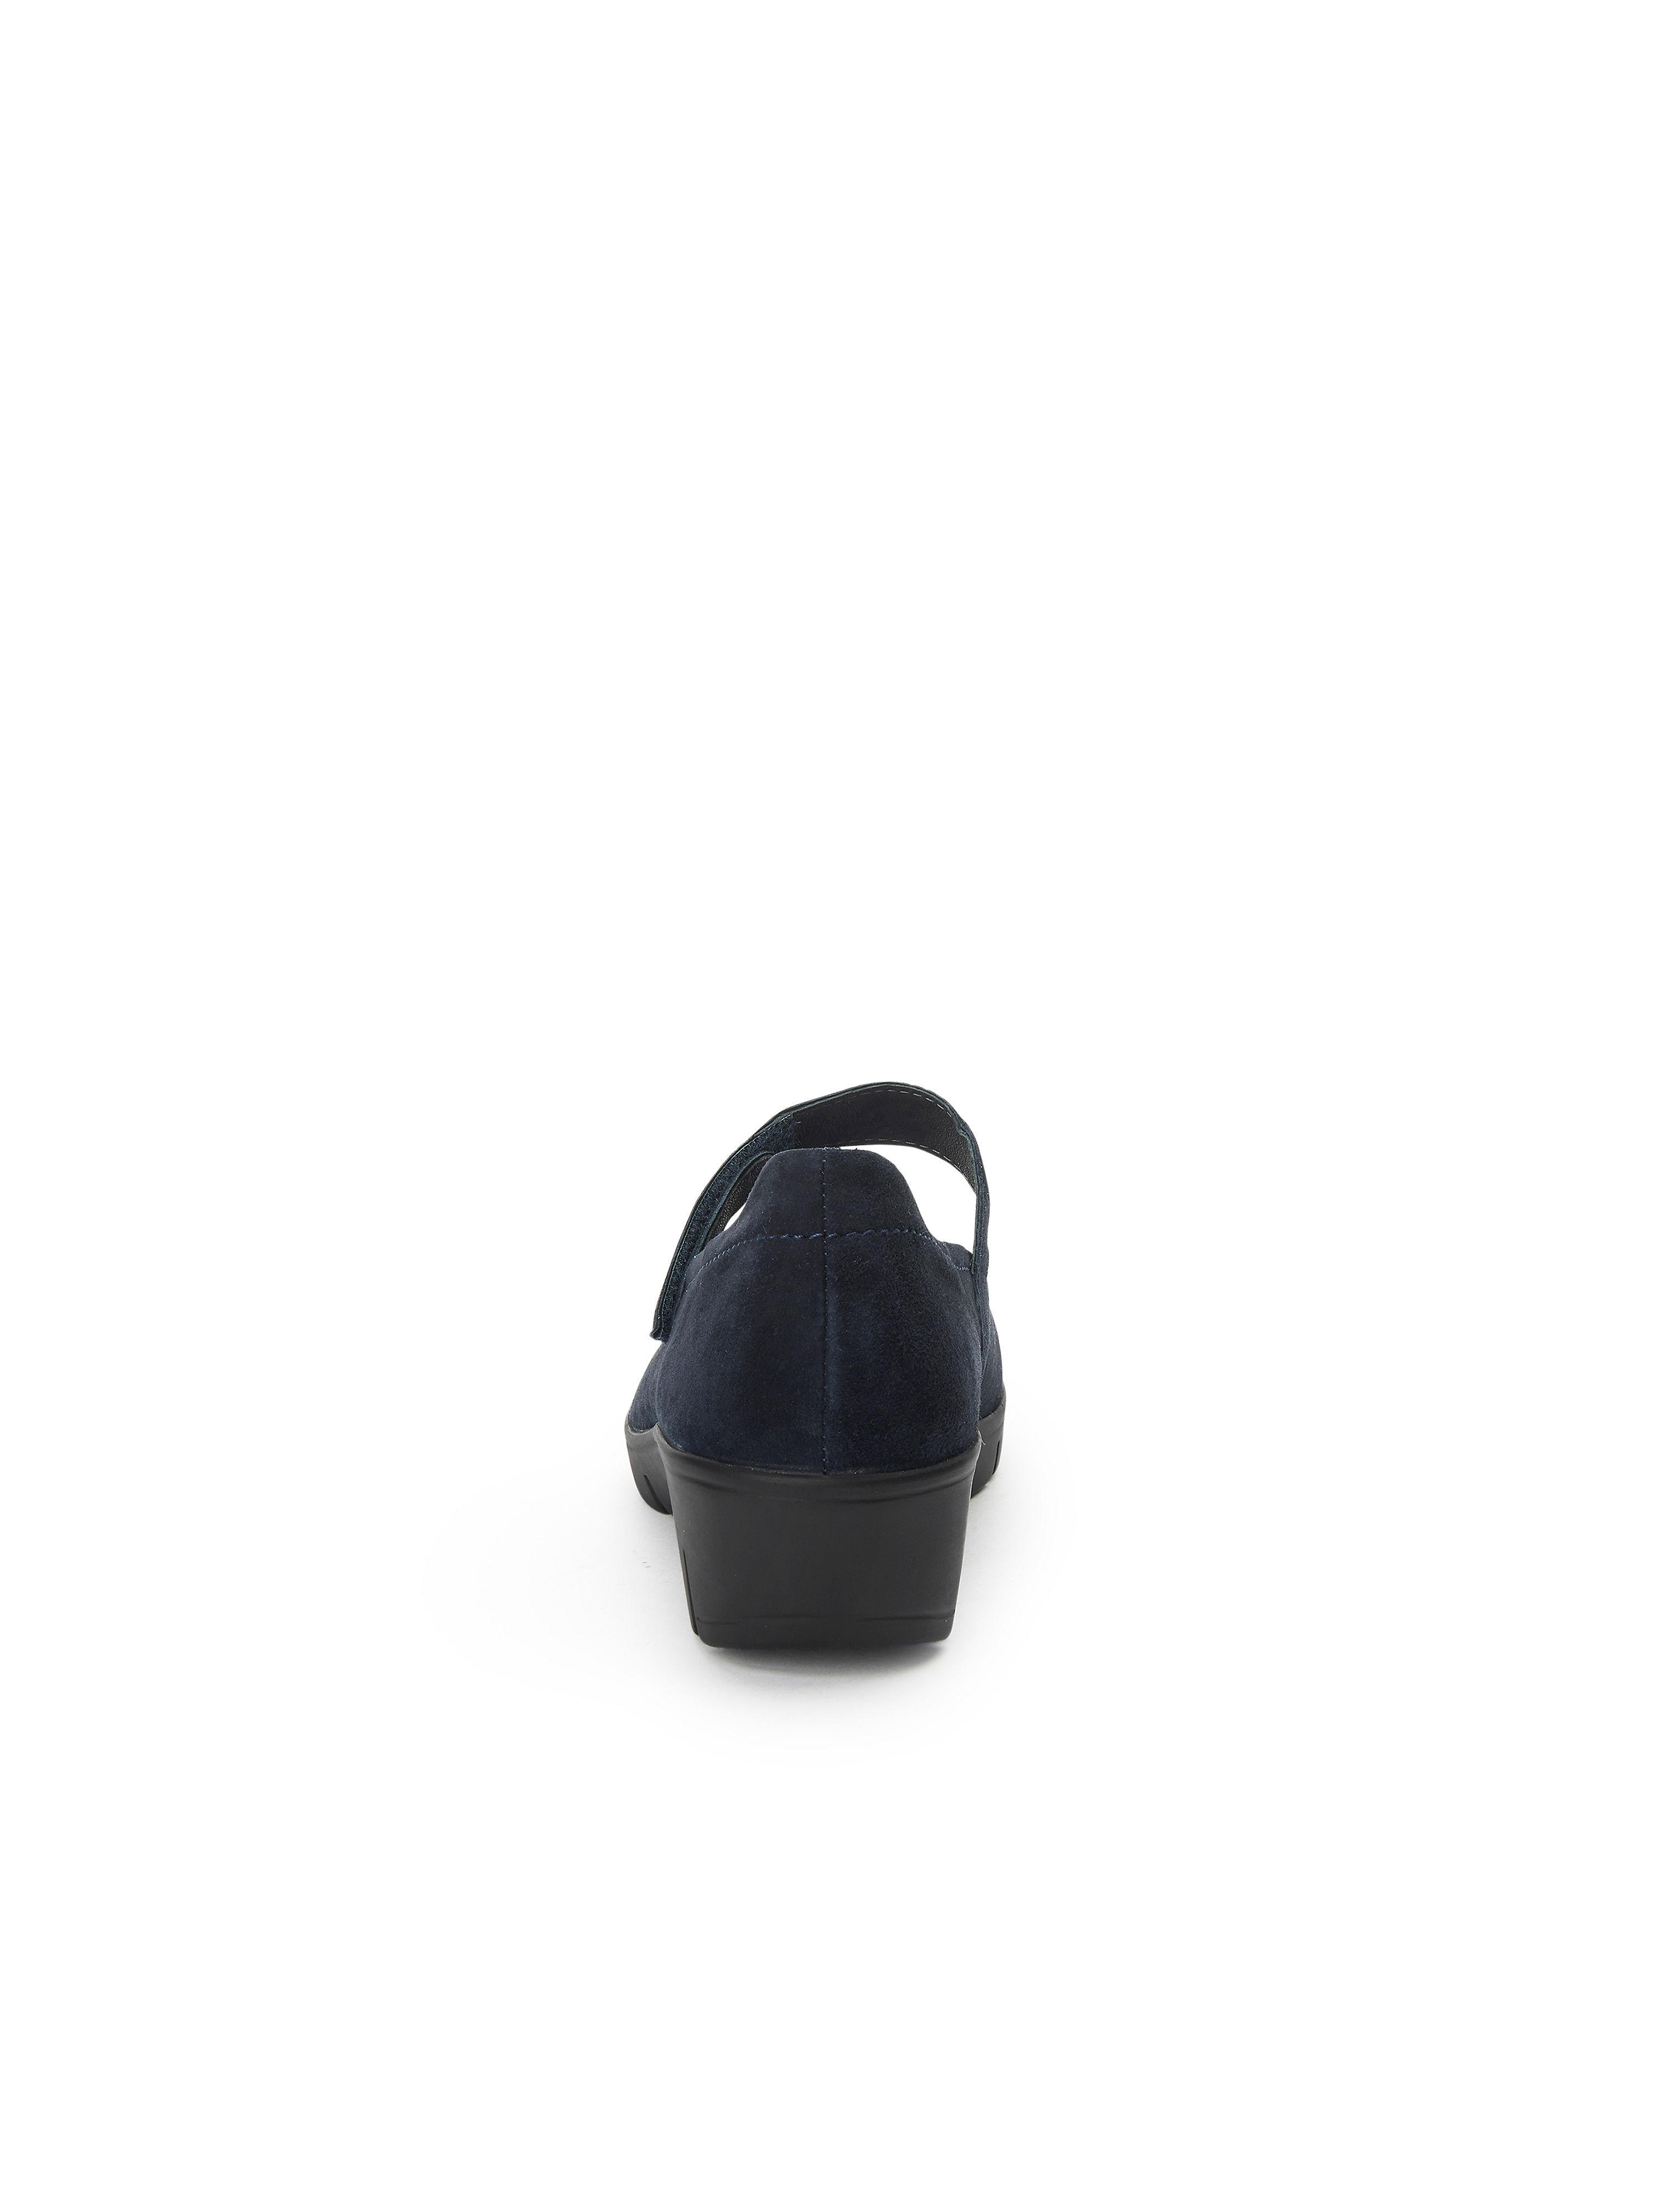 Semler - Ballerina Judith aus 100% Leder - Marine Gute Qualität beliebte Schuhe